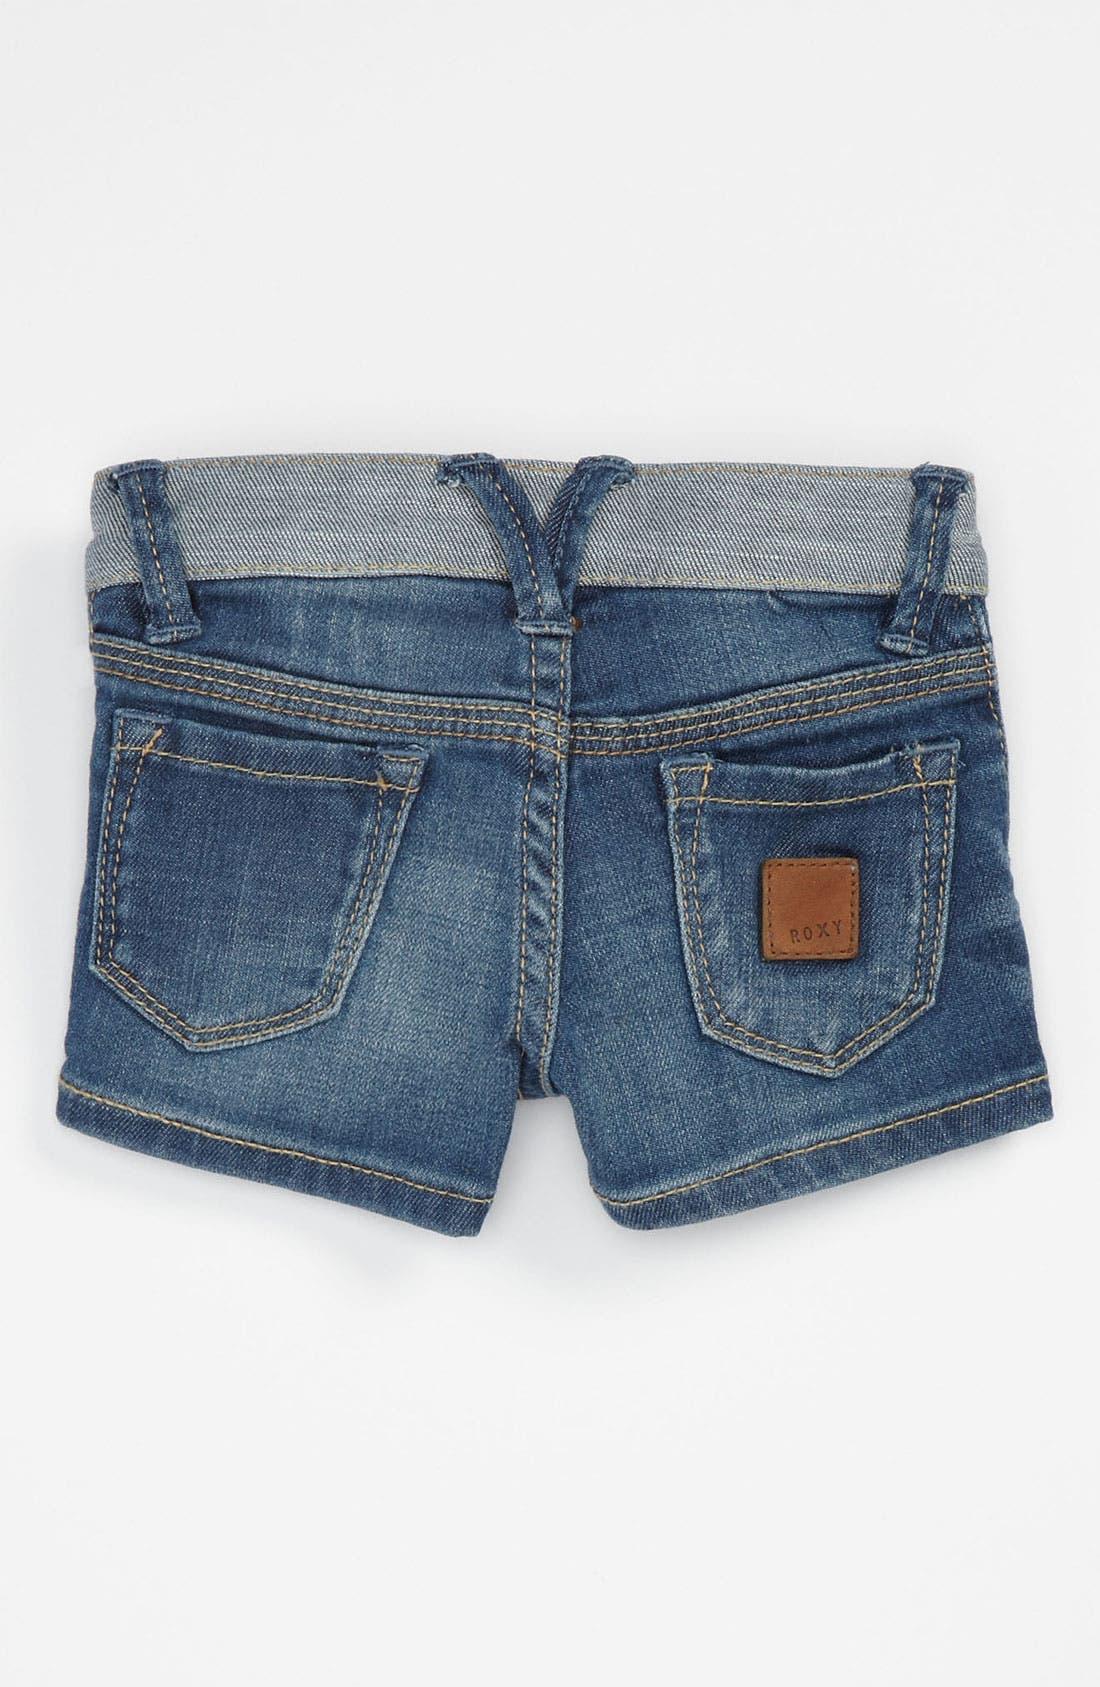 Main Image - 'Sundown' Denim Shorts (Toddler)